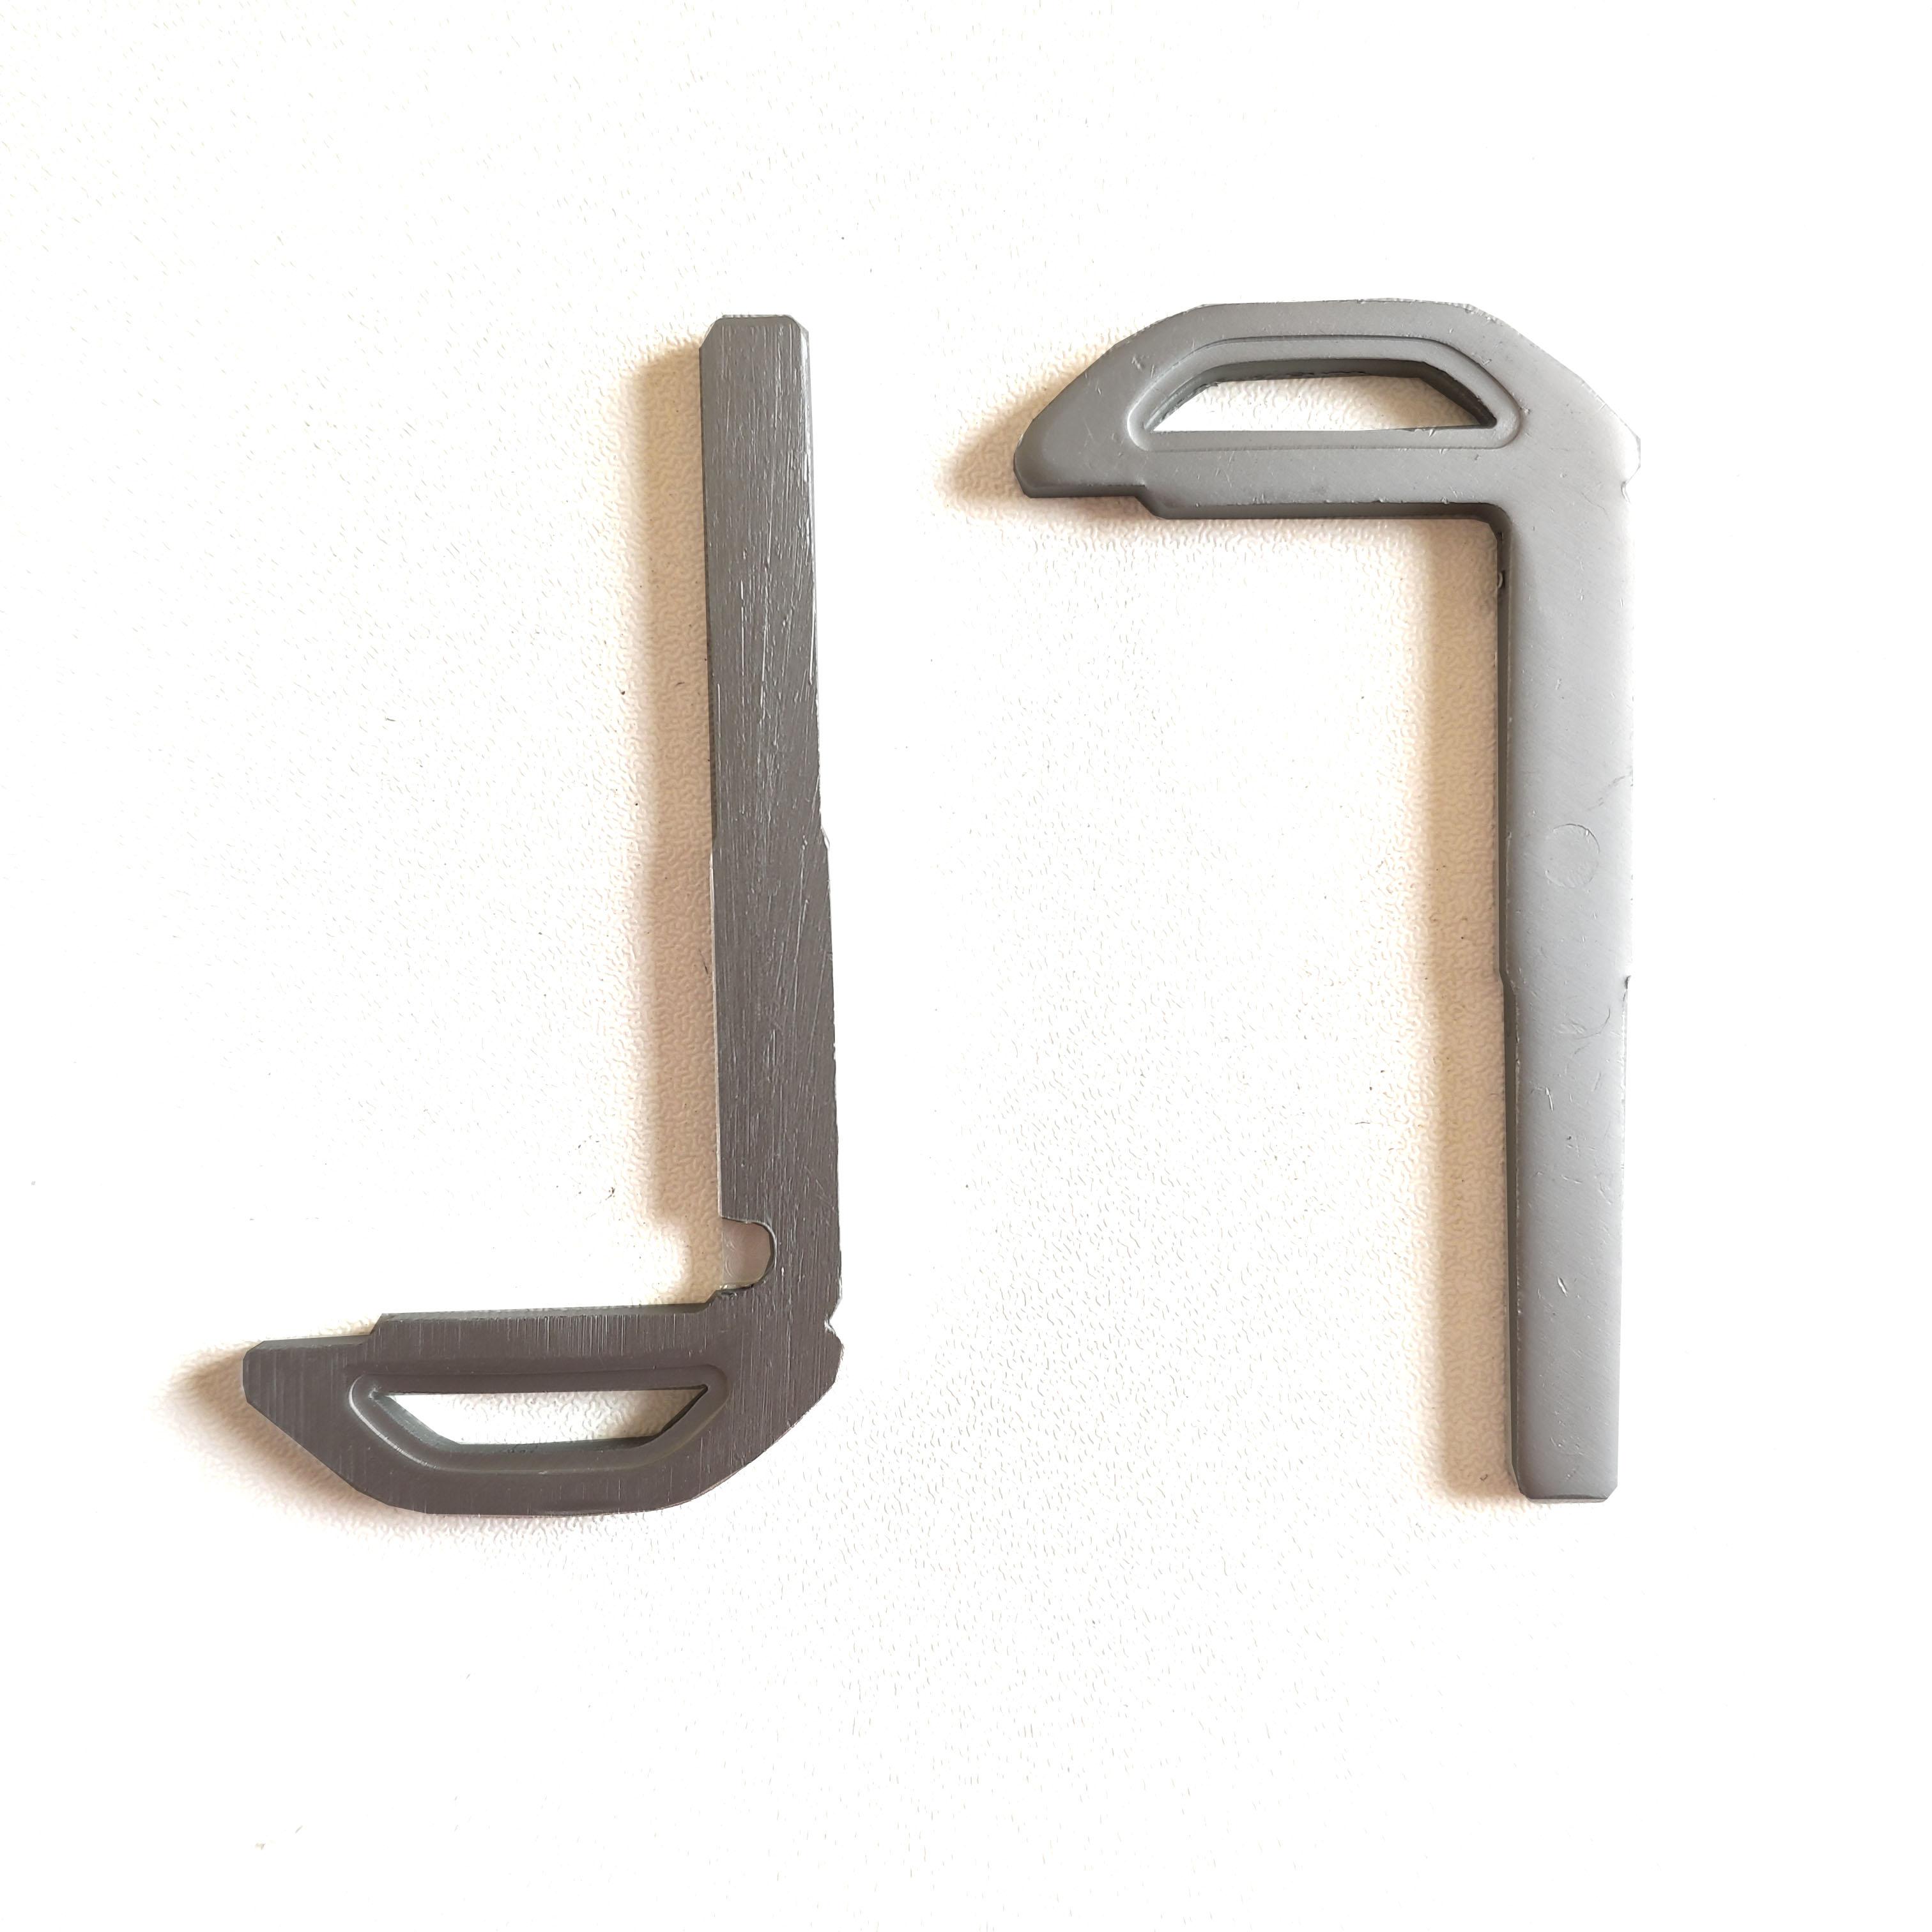 Uncut Blade For XC60 Volvo Key